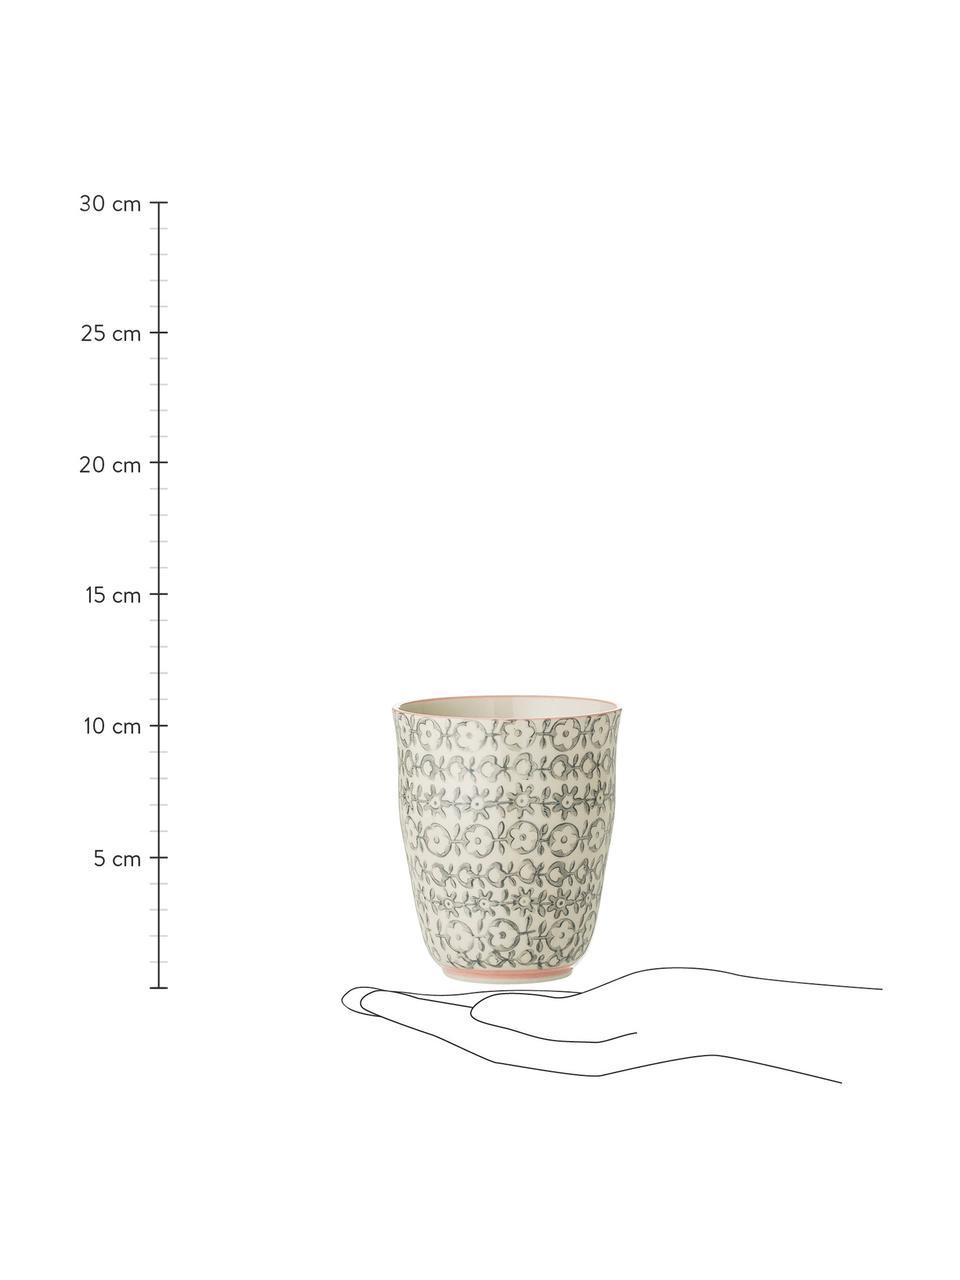 Becher Cécile mit kleinem Muster, 3er-Set, Steingut, Beige, Grün, Rosa, Ø 9 x H 10 cm